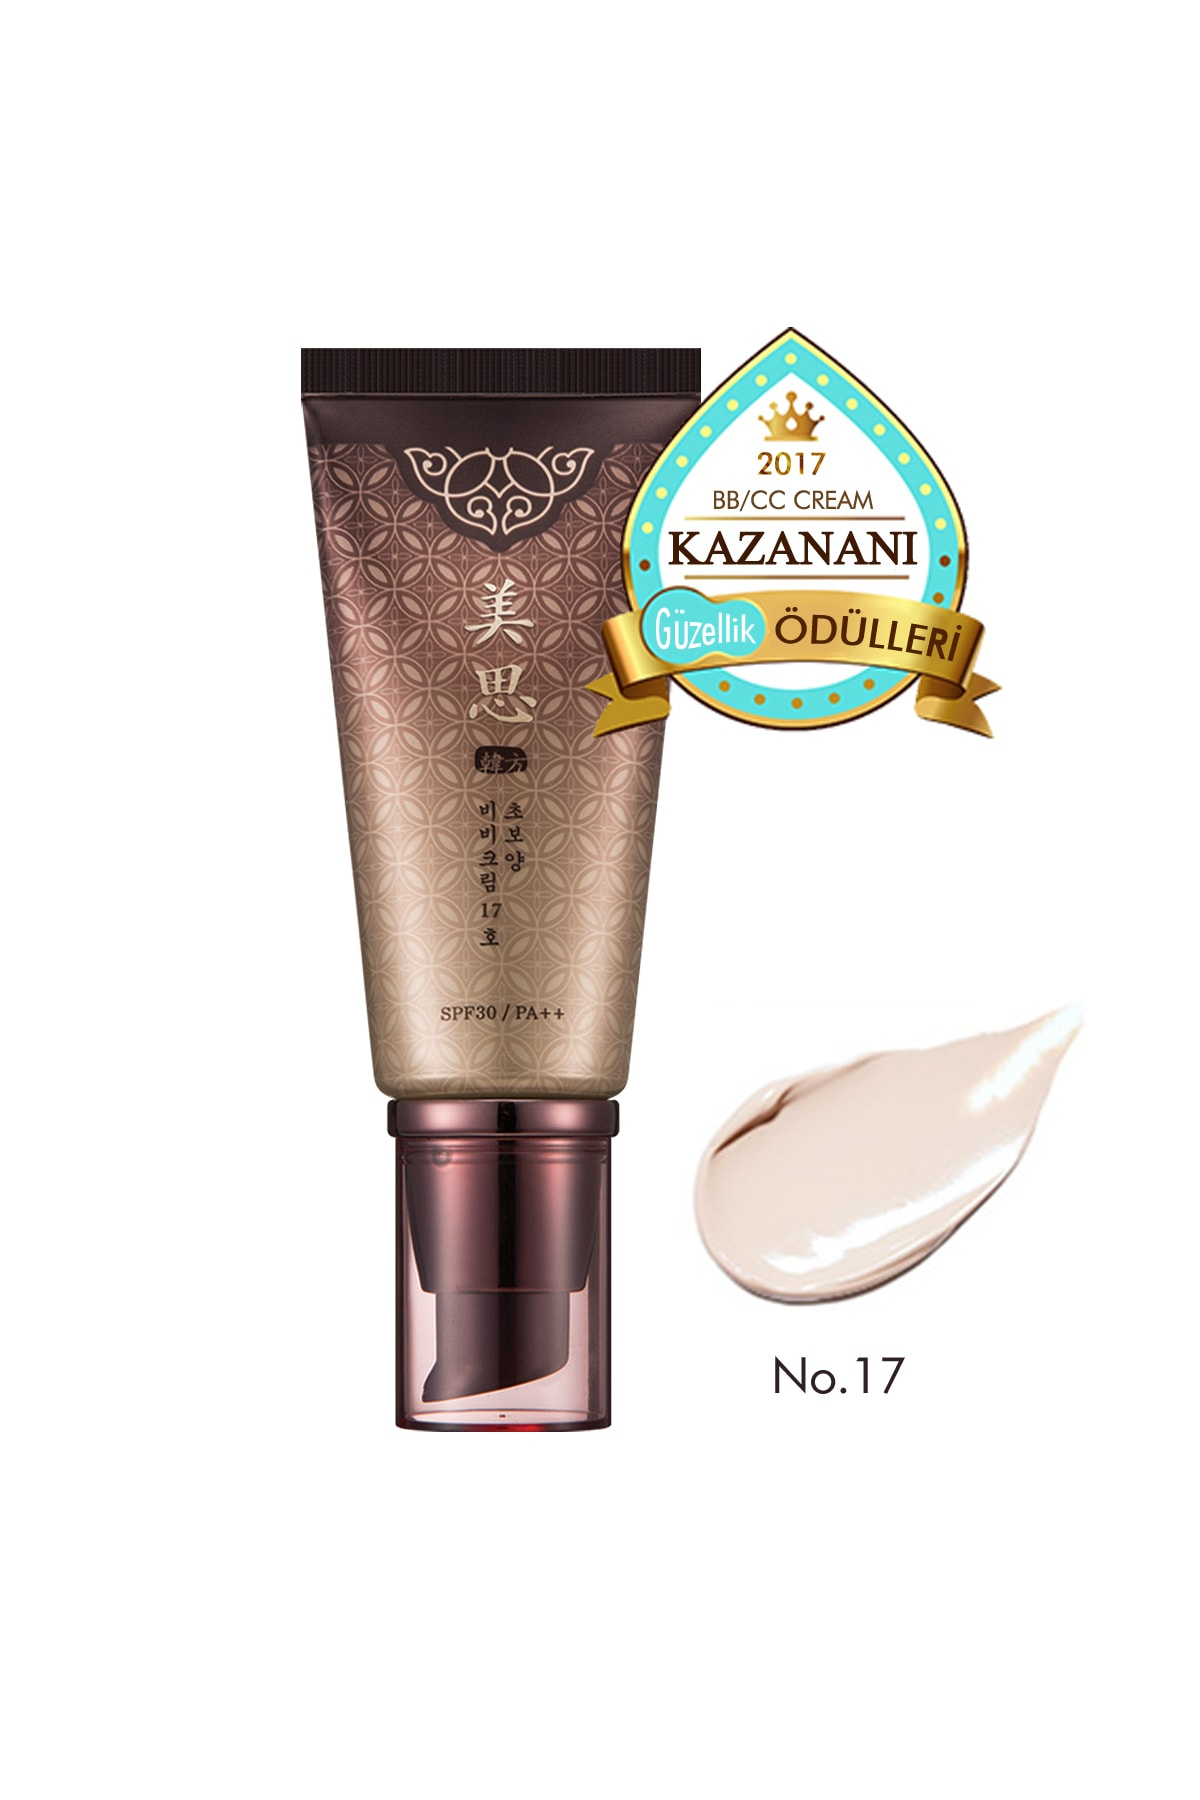 Missha Yoğun Kapatıcı Bitkisel BB Krem 50ml MISA Cho Bo Yang BB Cream SPF30/PA++ (No.17 )